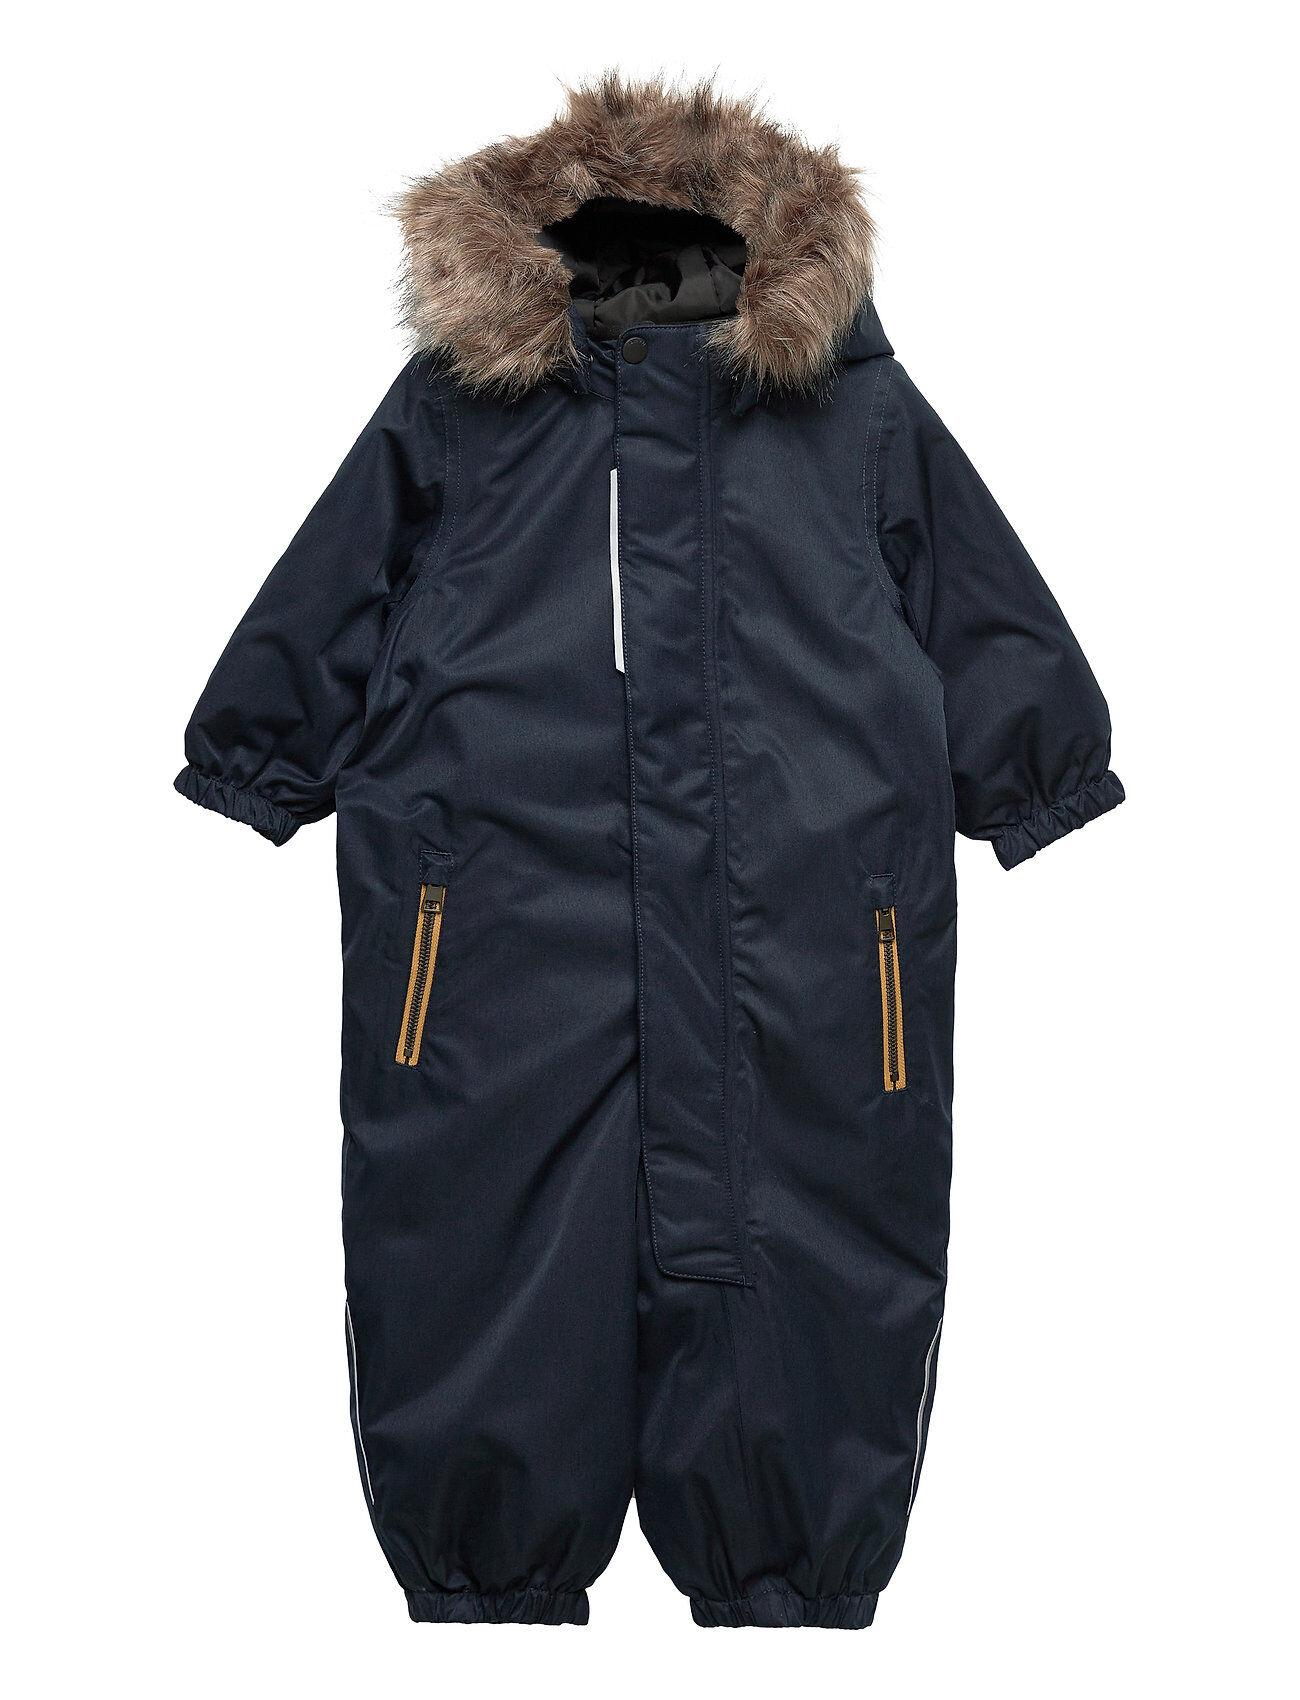 name it Nmmsnow10 Suit 2fo Outerwear Snow/ski Clothing Snow/ski Suits & Sets Sininen Name It